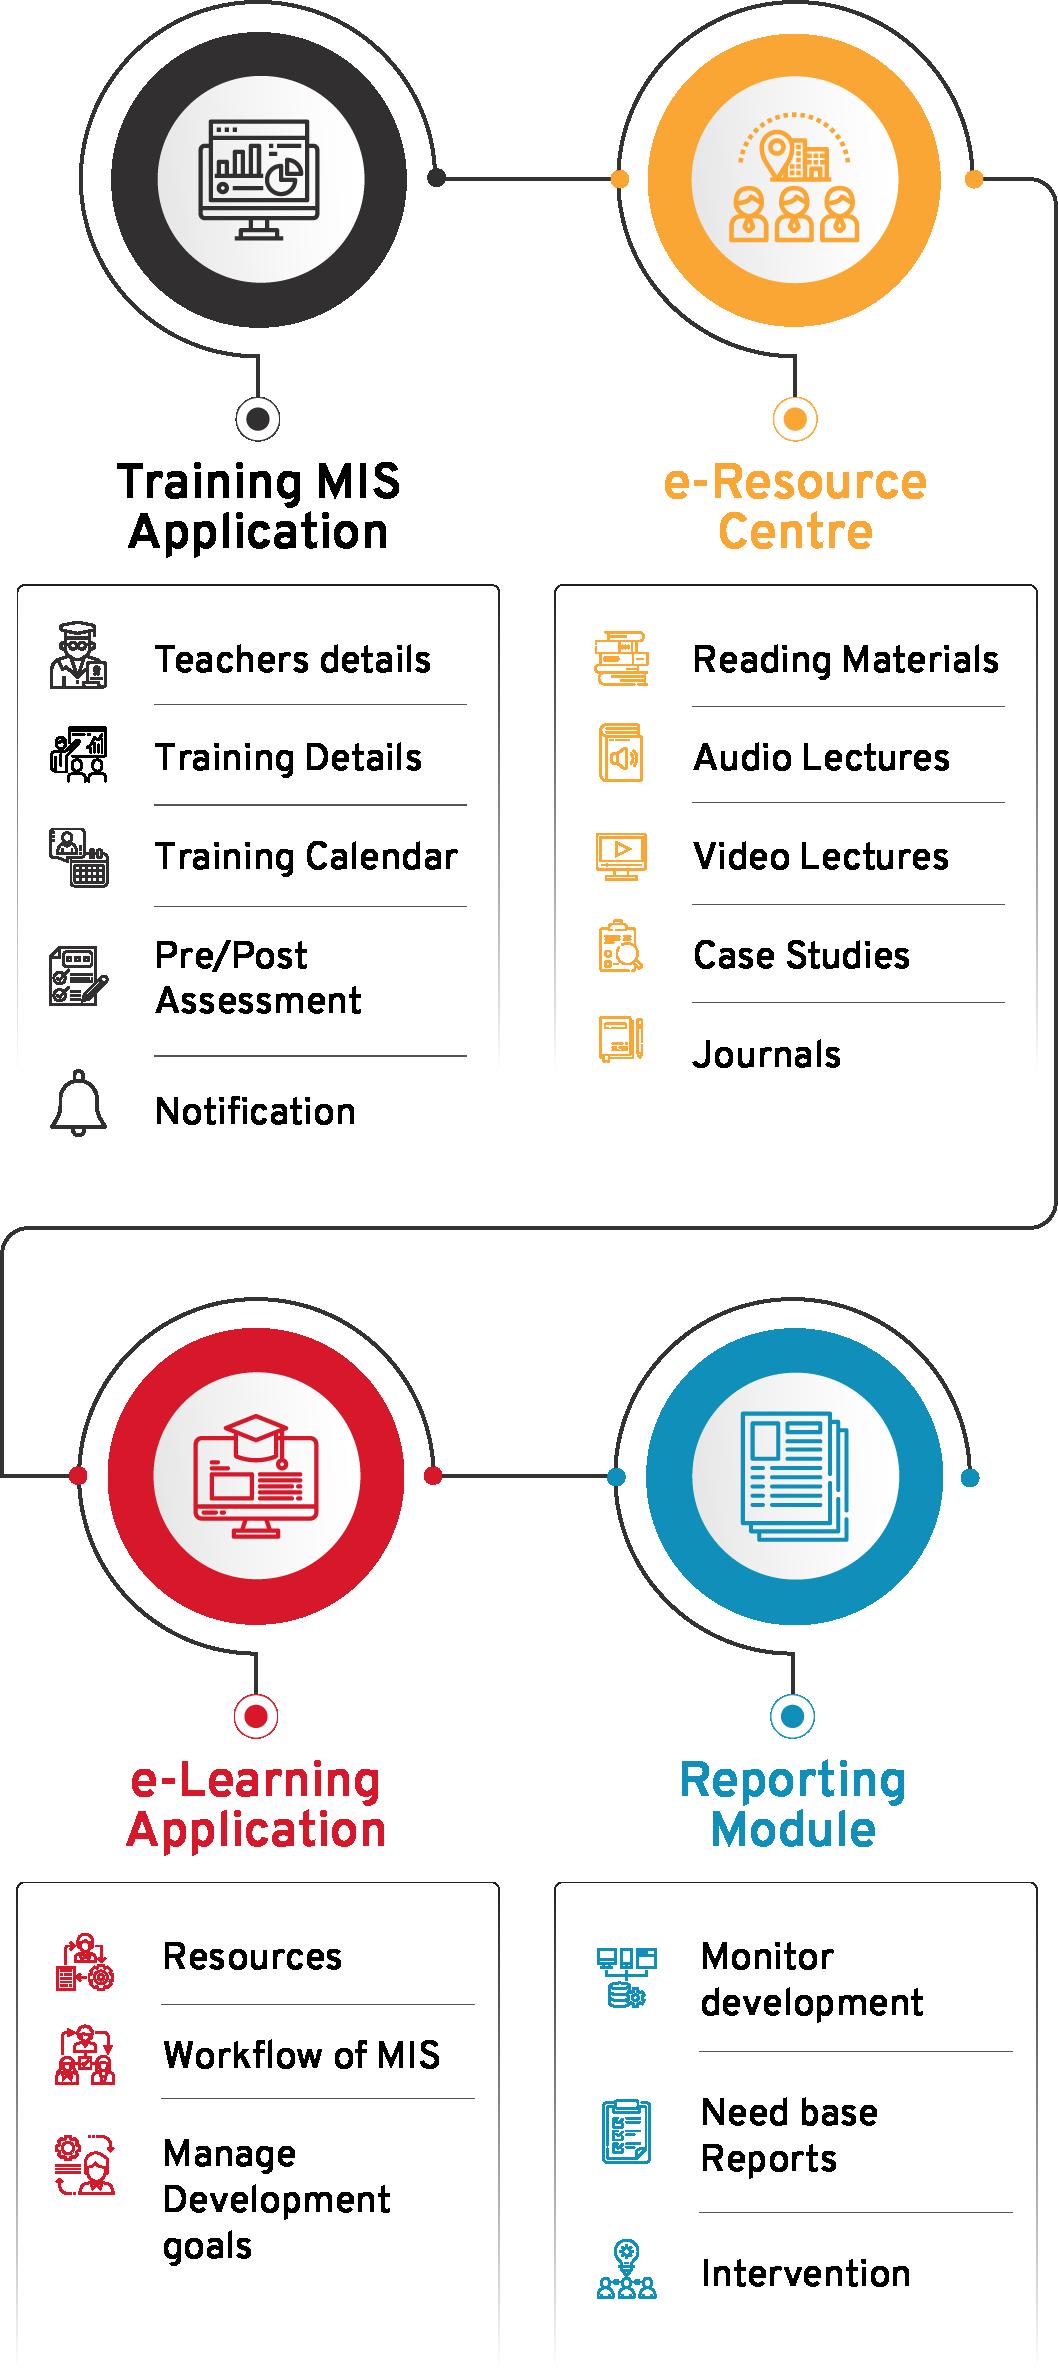 Training Management Information System Diagram Flow - CSM Technologies